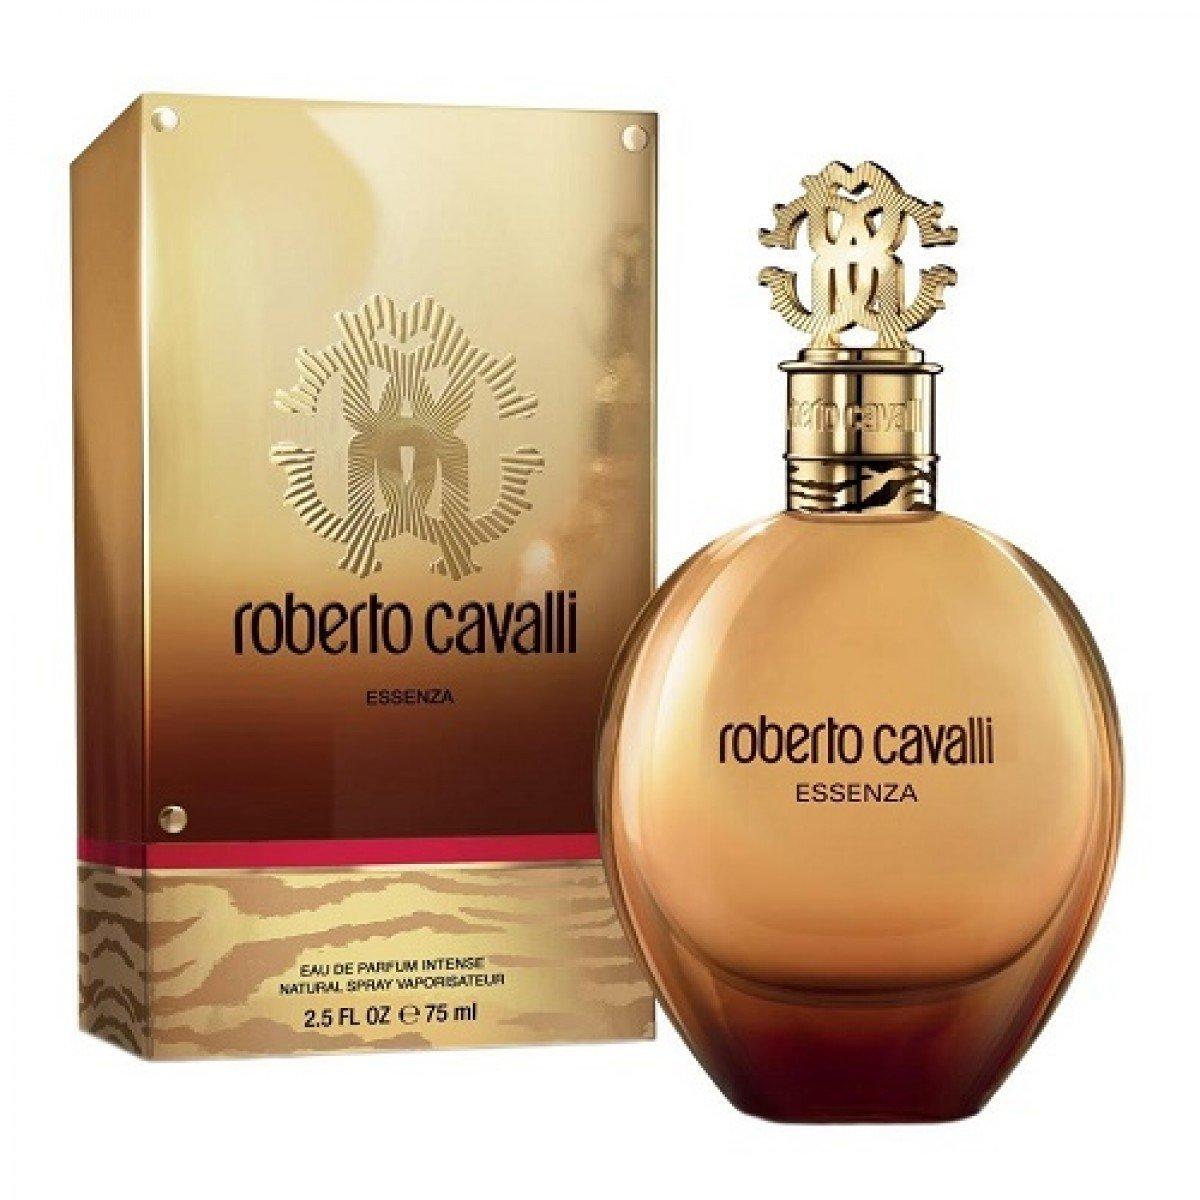 Roberto Cavali Just Cavalli Gold Edp 75ml For Women Fperfumes And